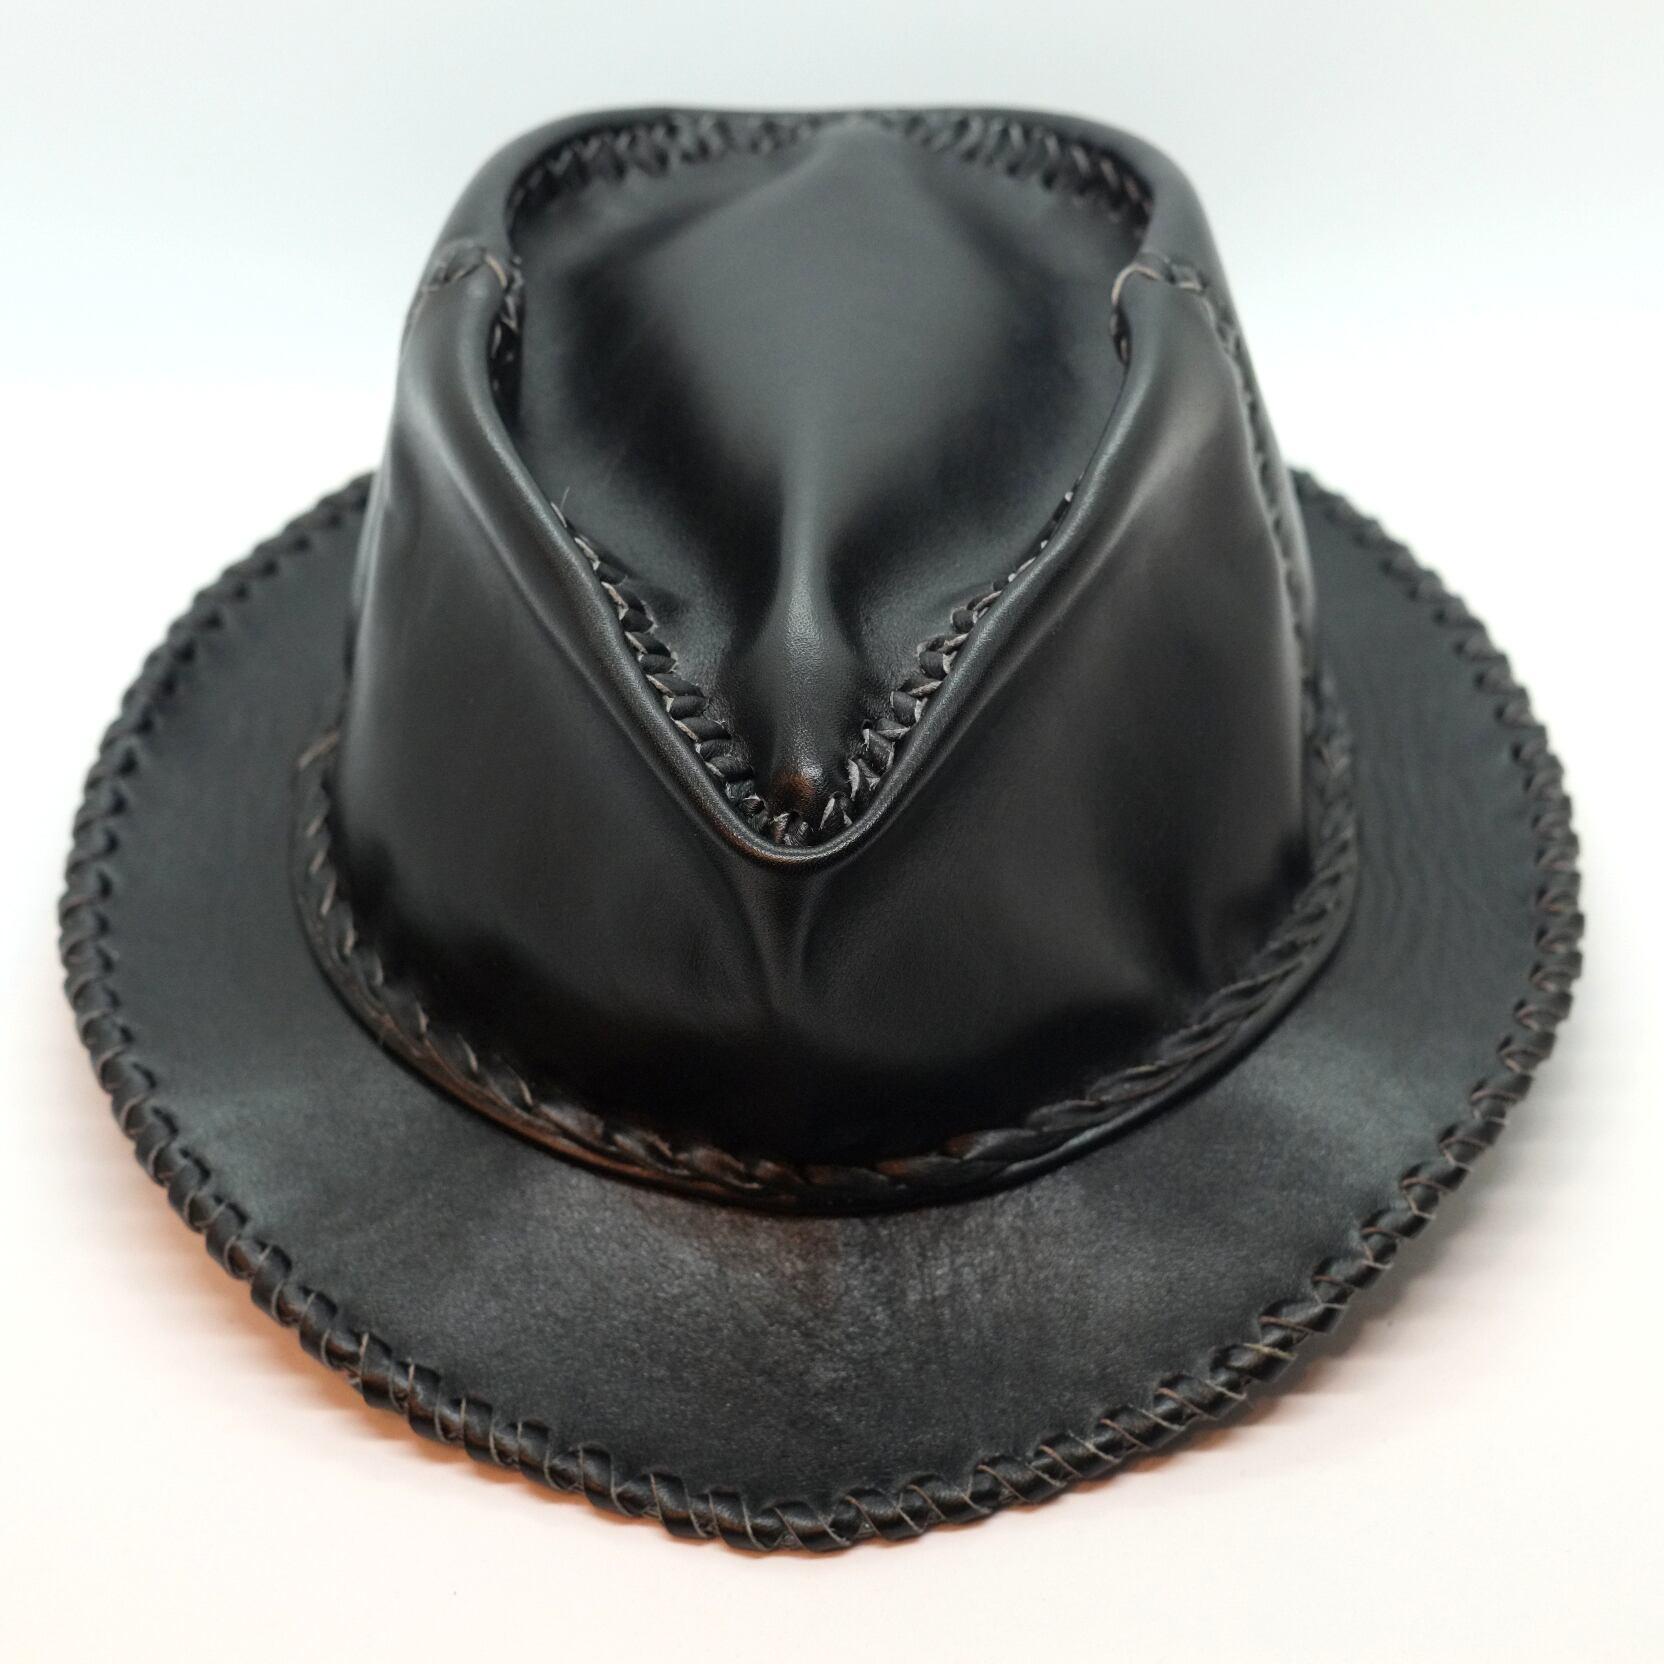 BAL-HAT-NEO(BLACK HORSE)予約受付販売